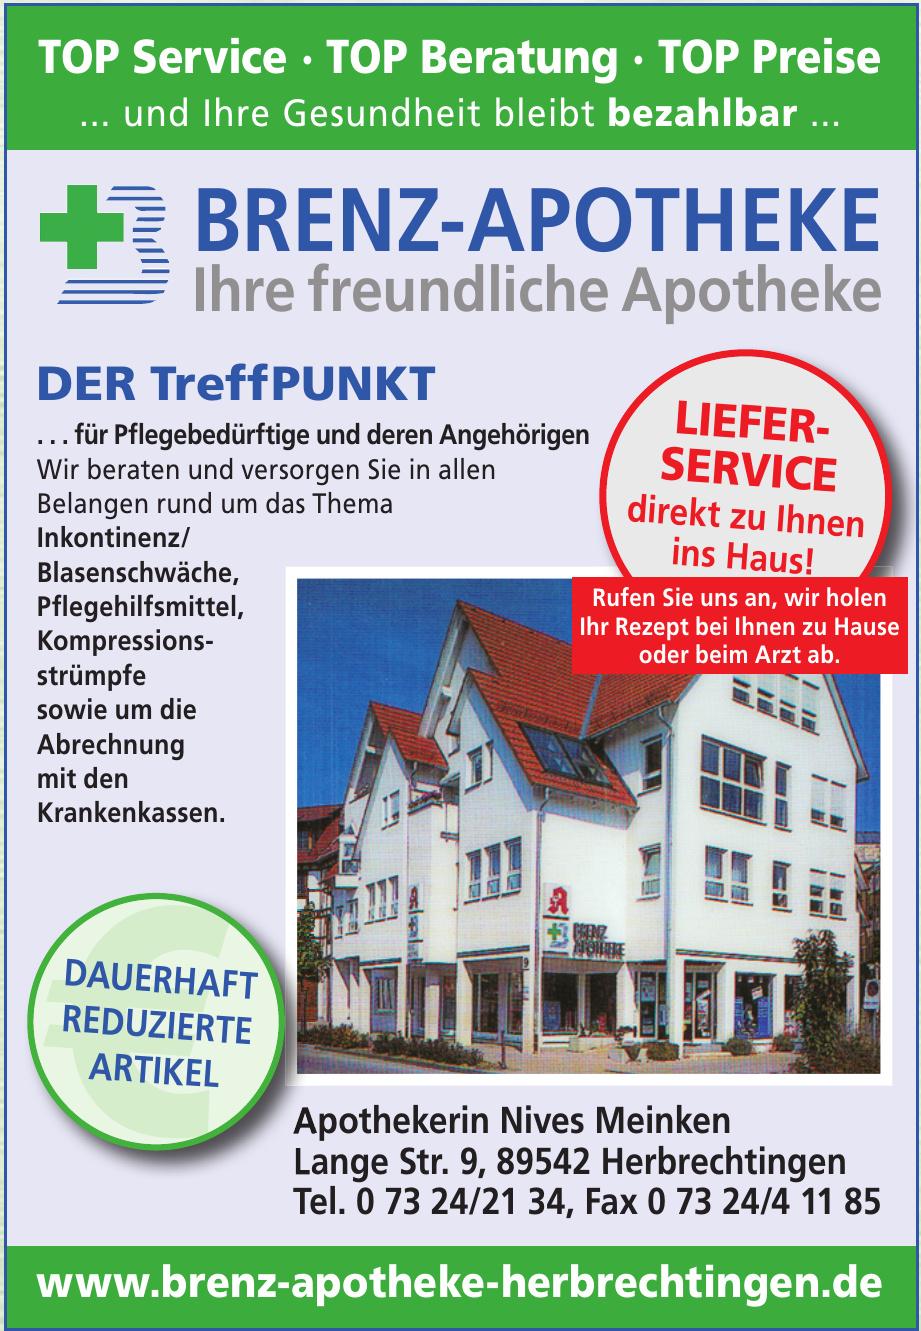 Brenz-Apotheke Apothekerin Nives Meinken